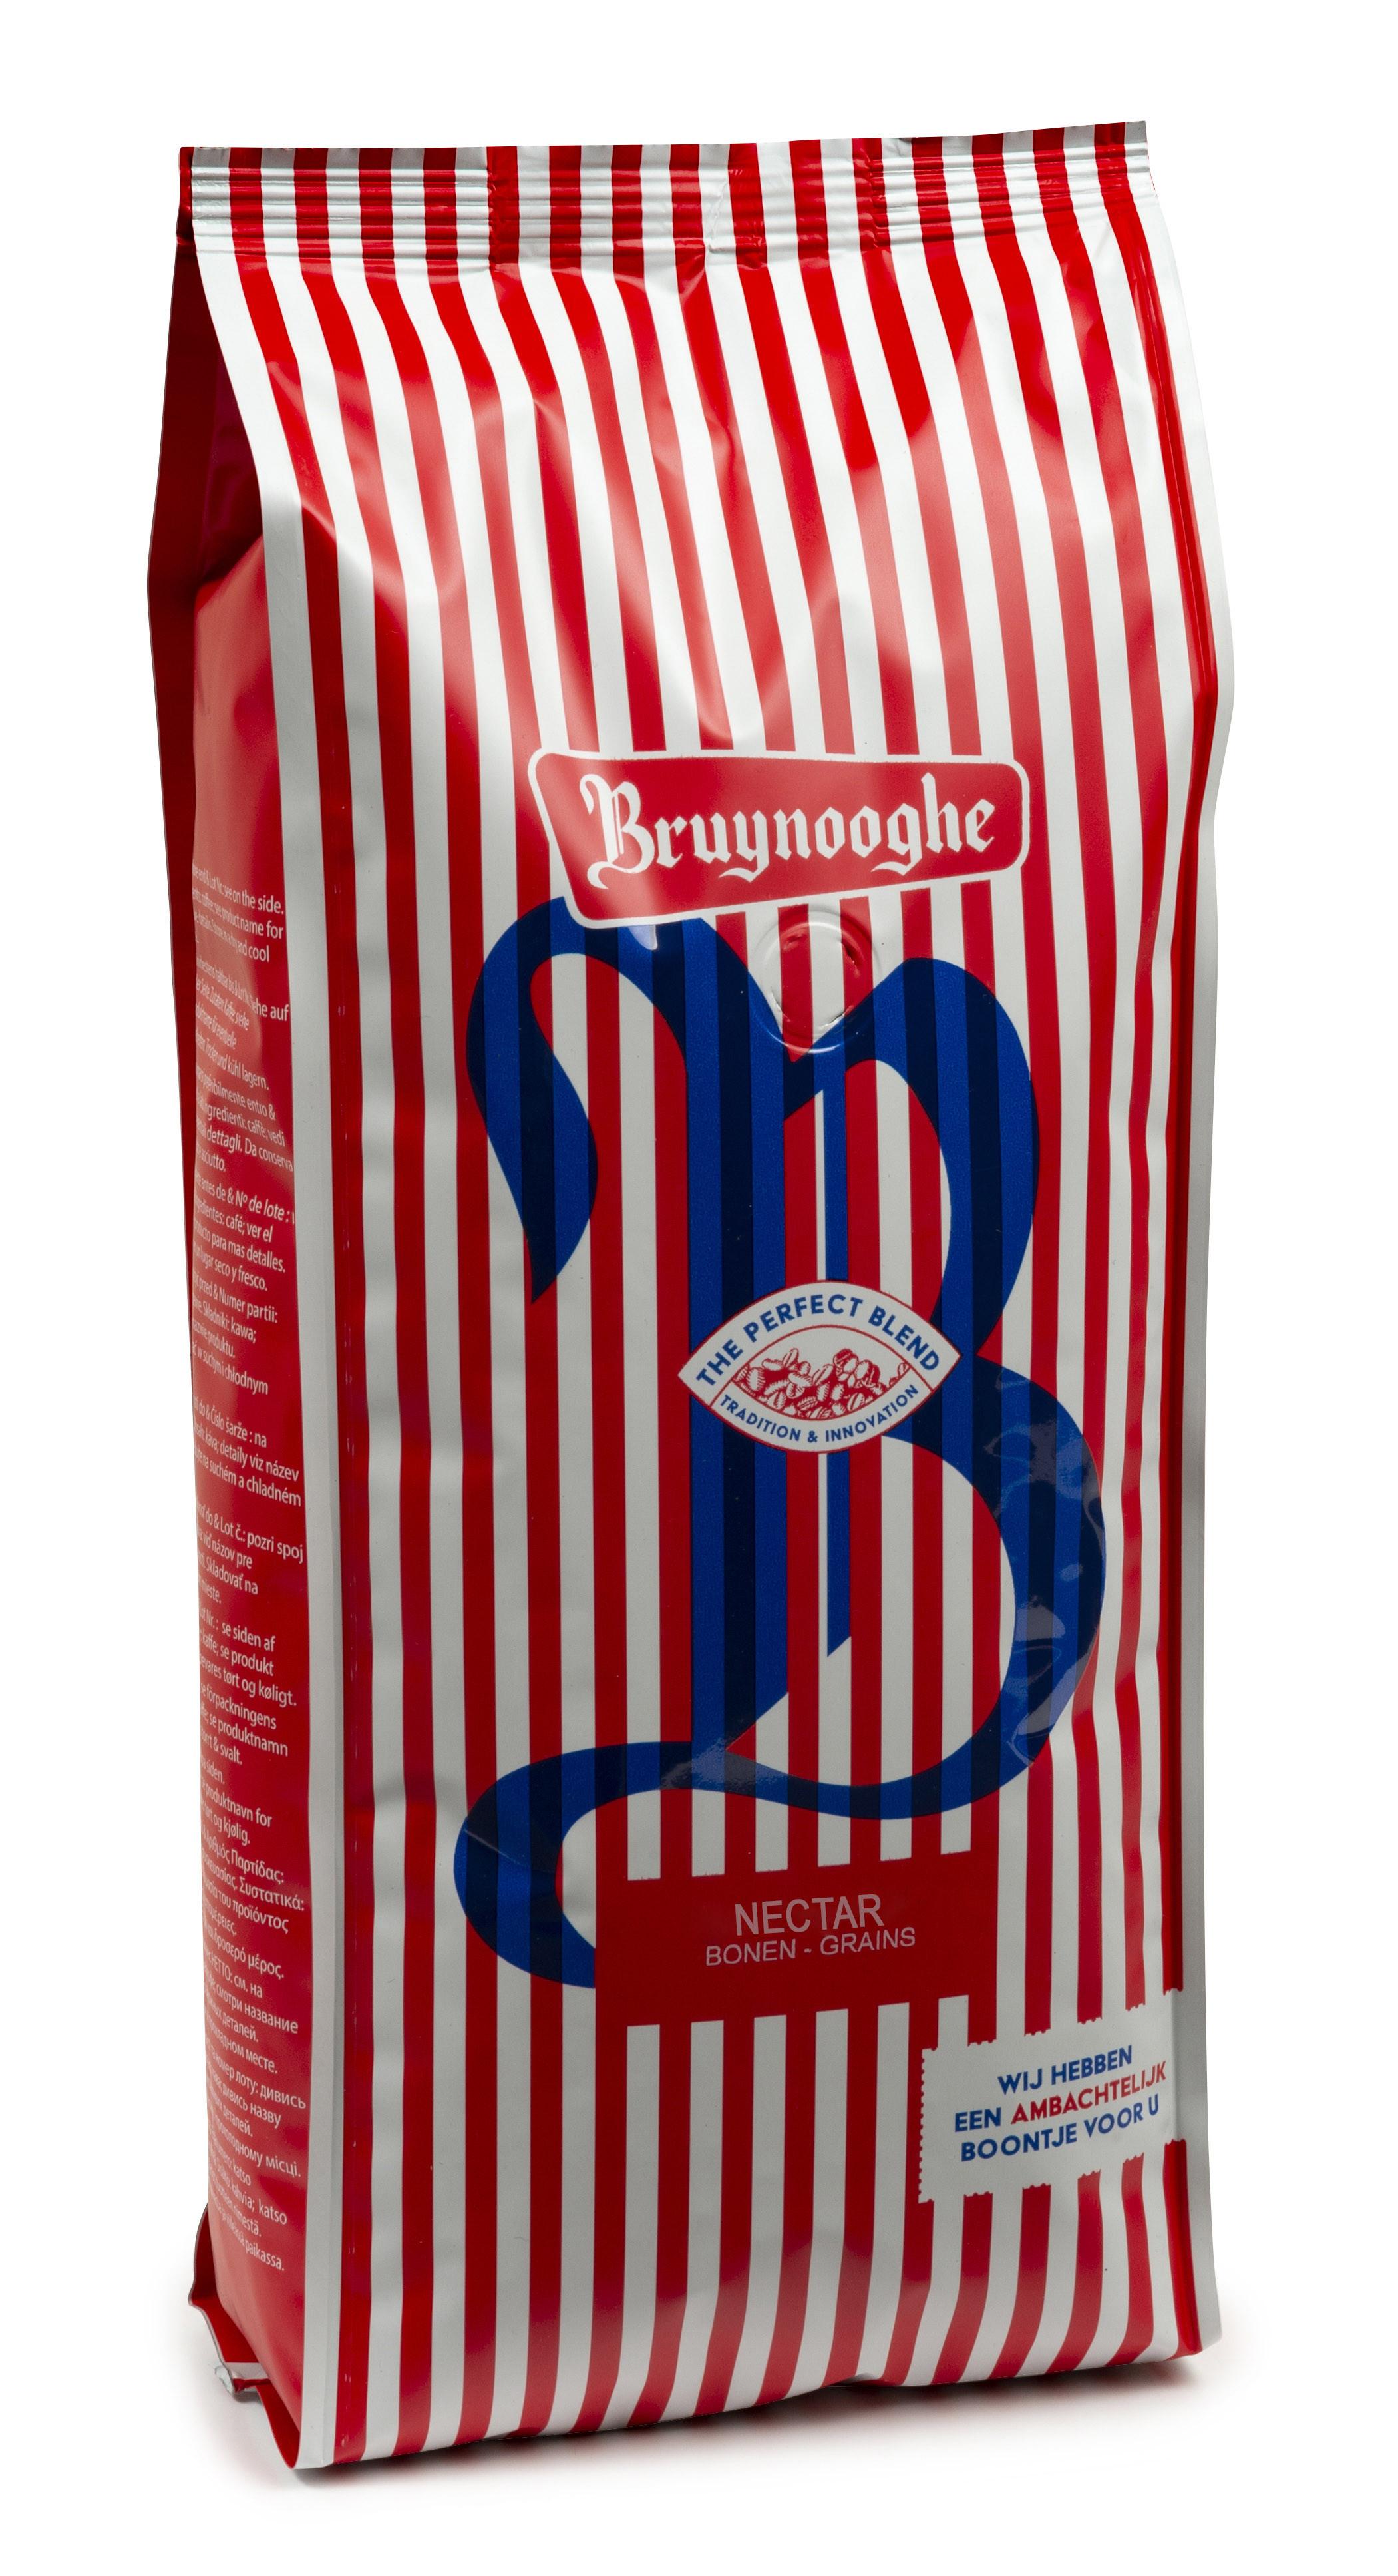 Café Bruynooghe Nectar en grains 1kg (Koffie)